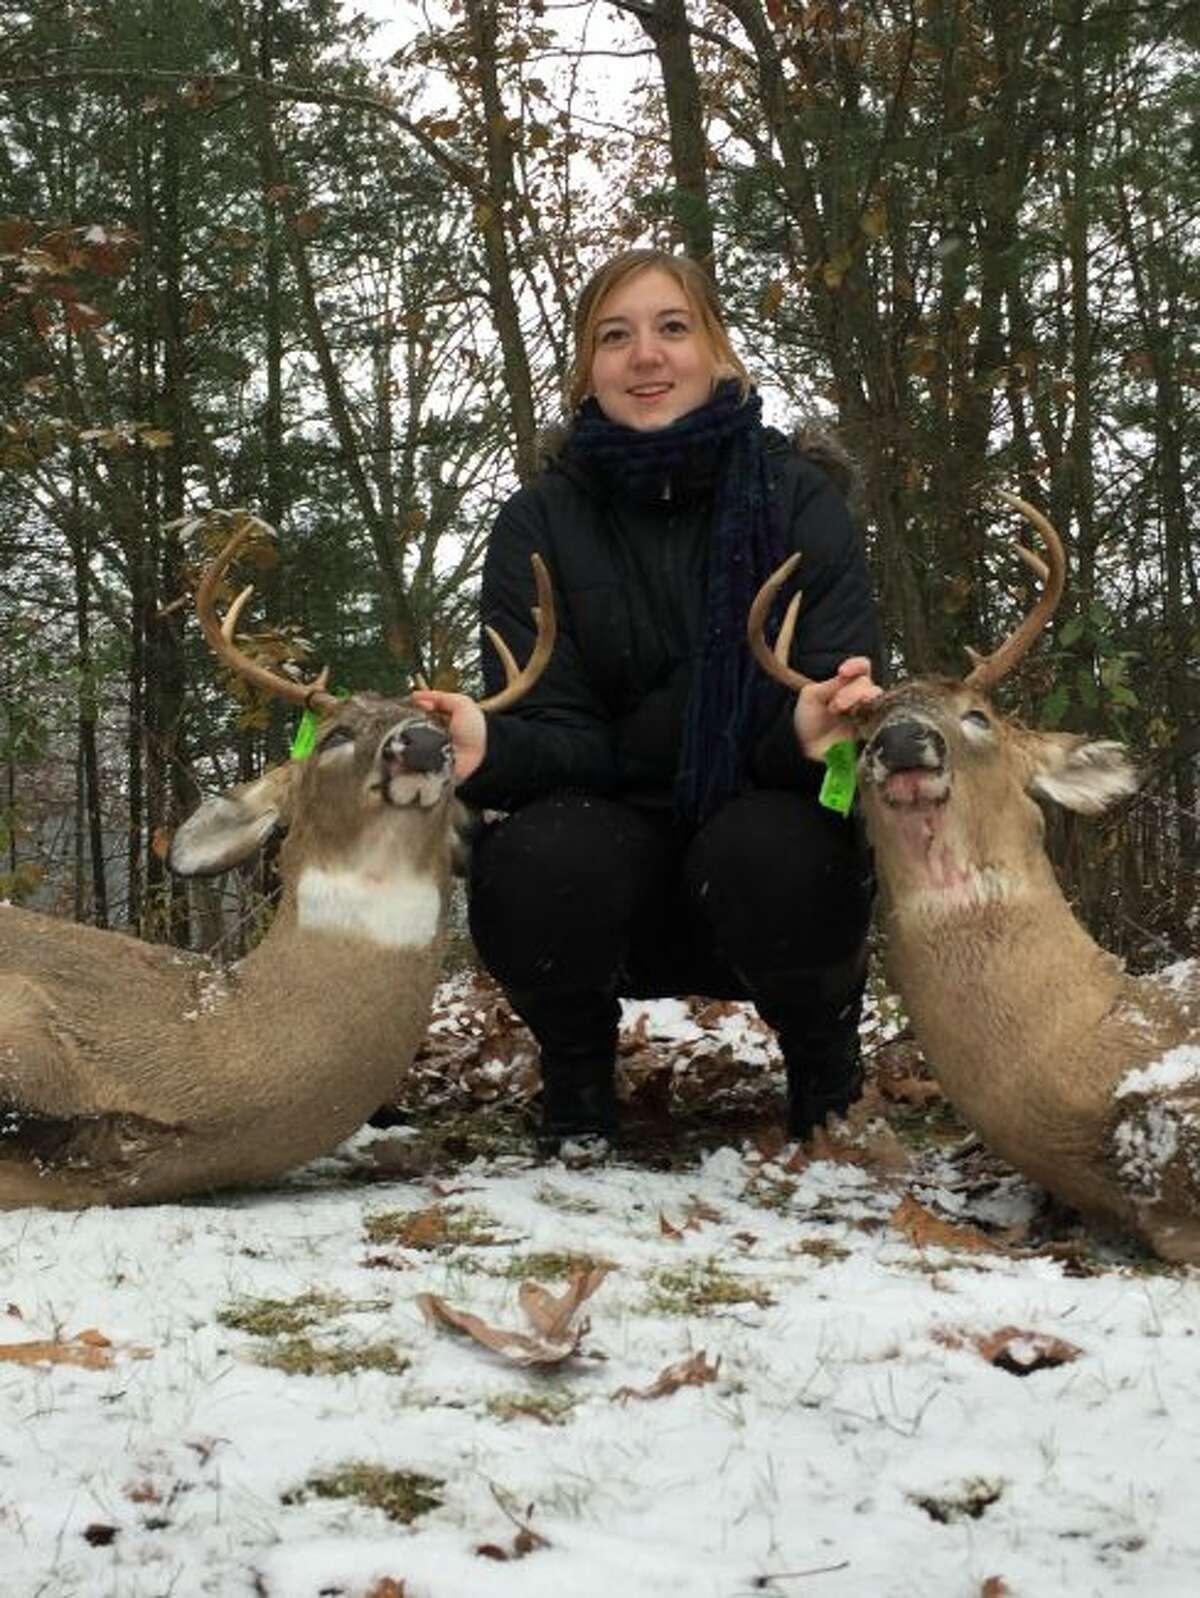 Emily Fabus shows her two bucks/